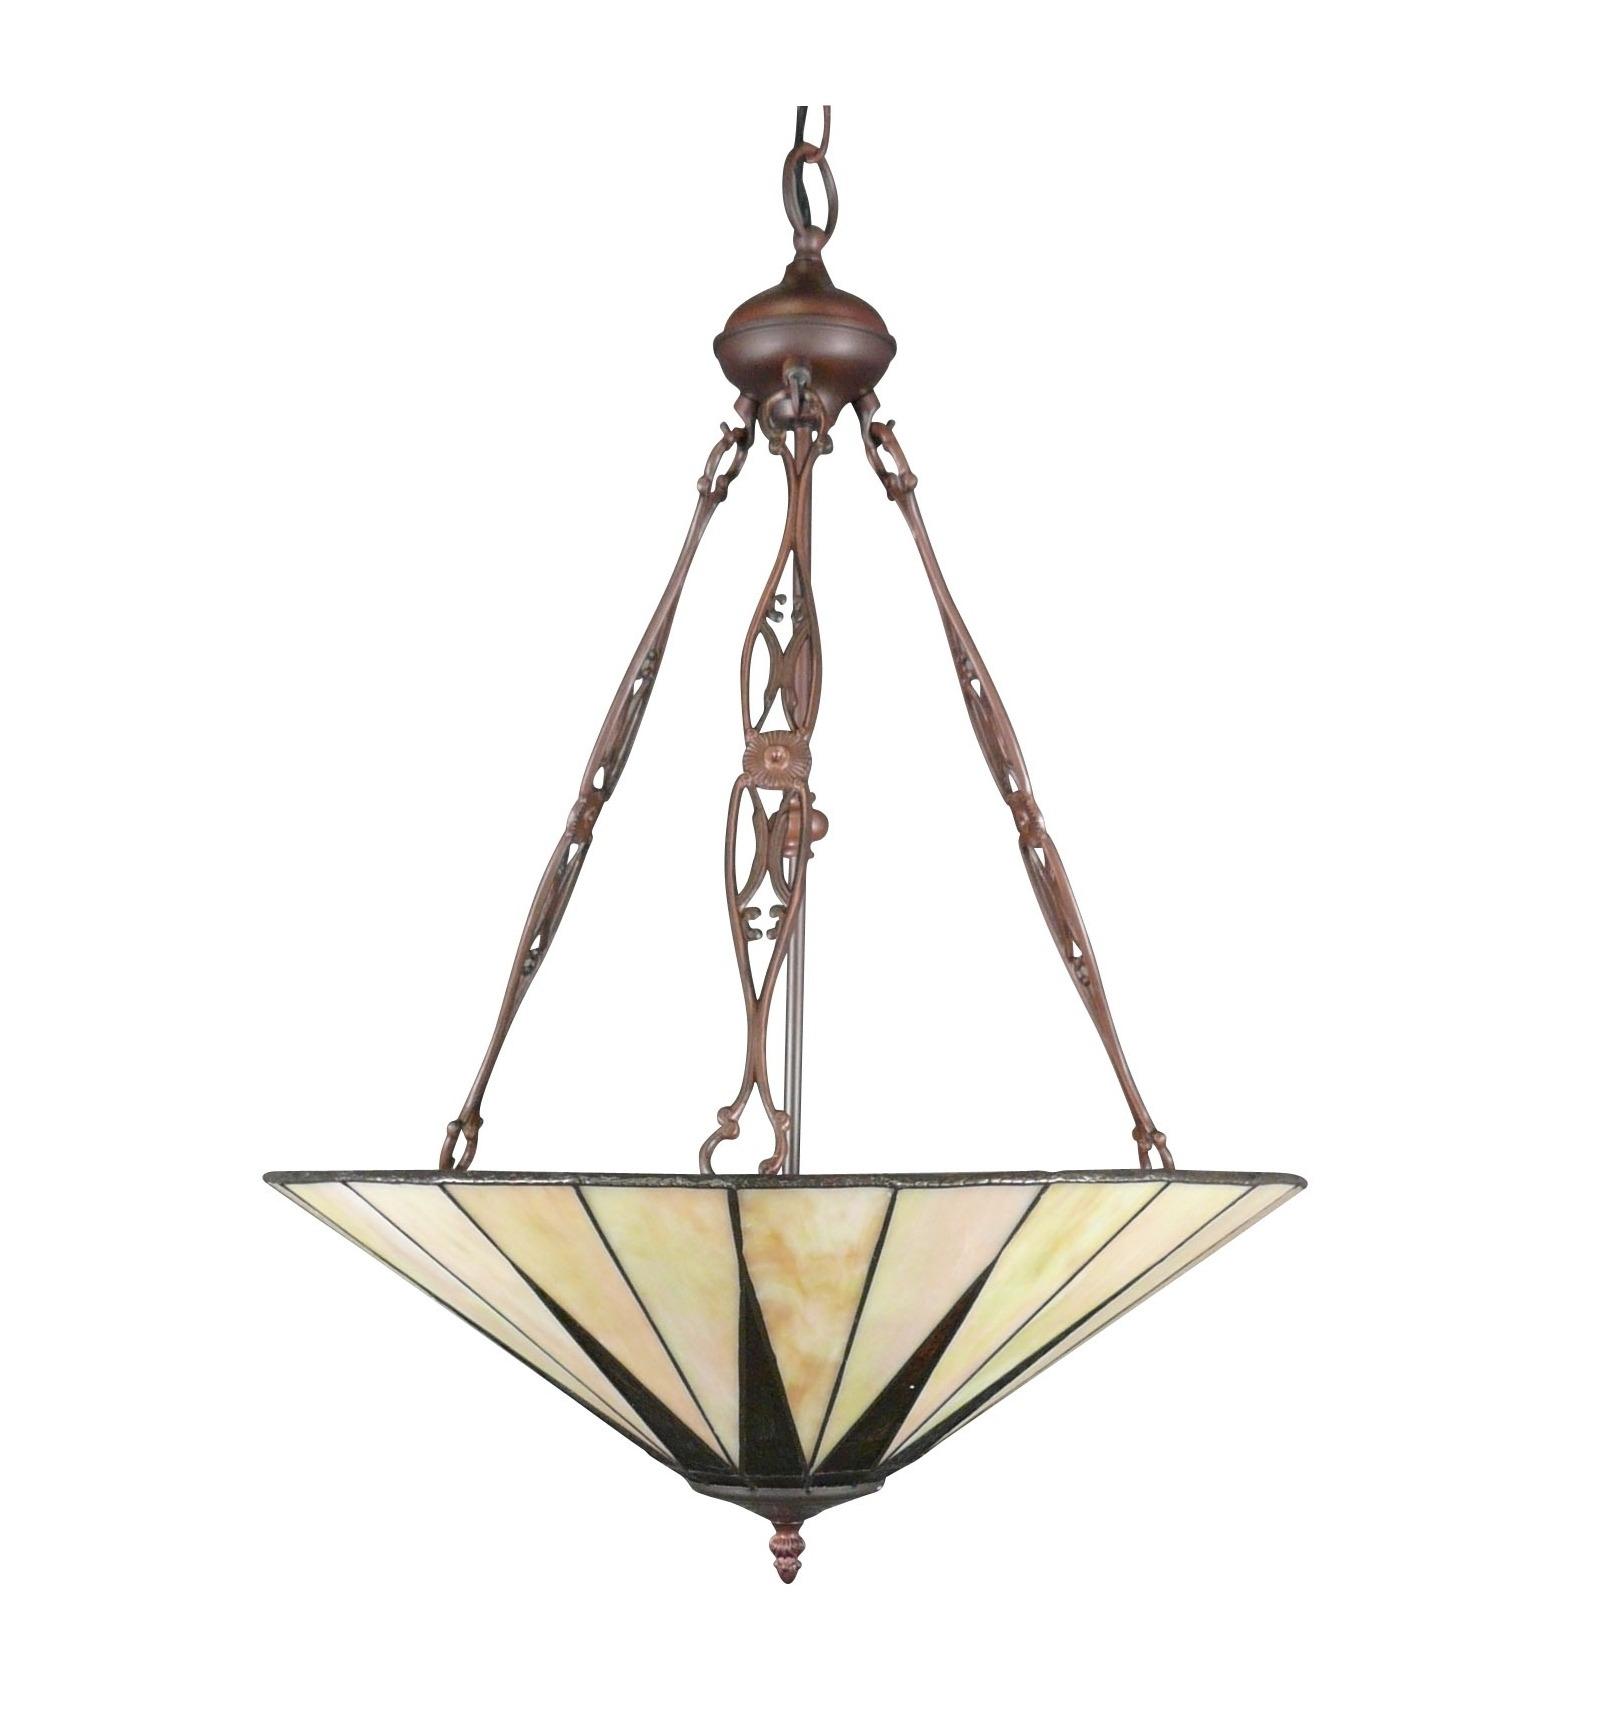 Chandelier style Tiffany art deco - lamp and floor lamp